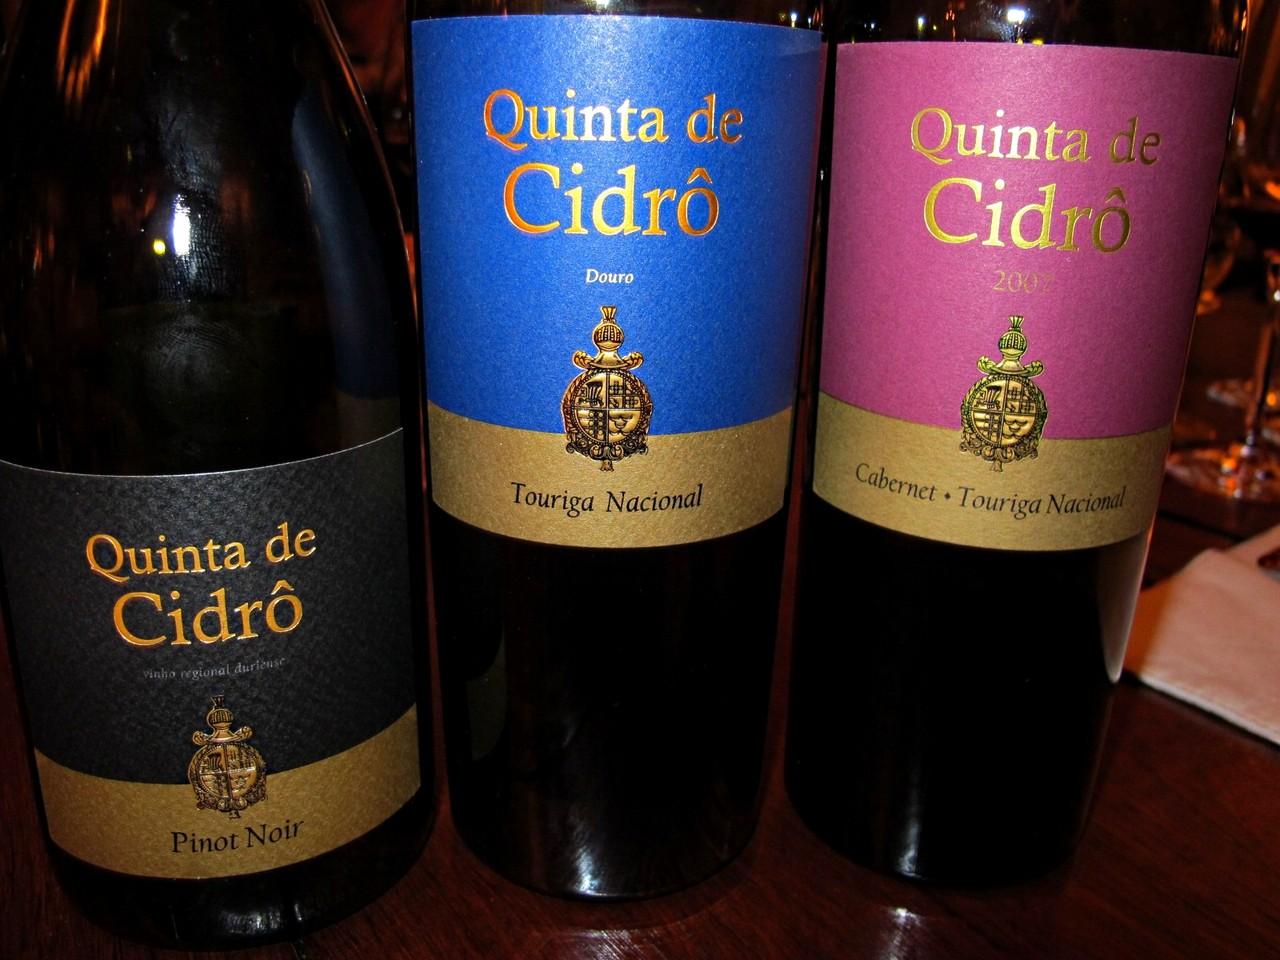 Trio maravilha: Pinot Noir, Touriga Nacional, Cabernet Sauvignon & Touriga Nacional